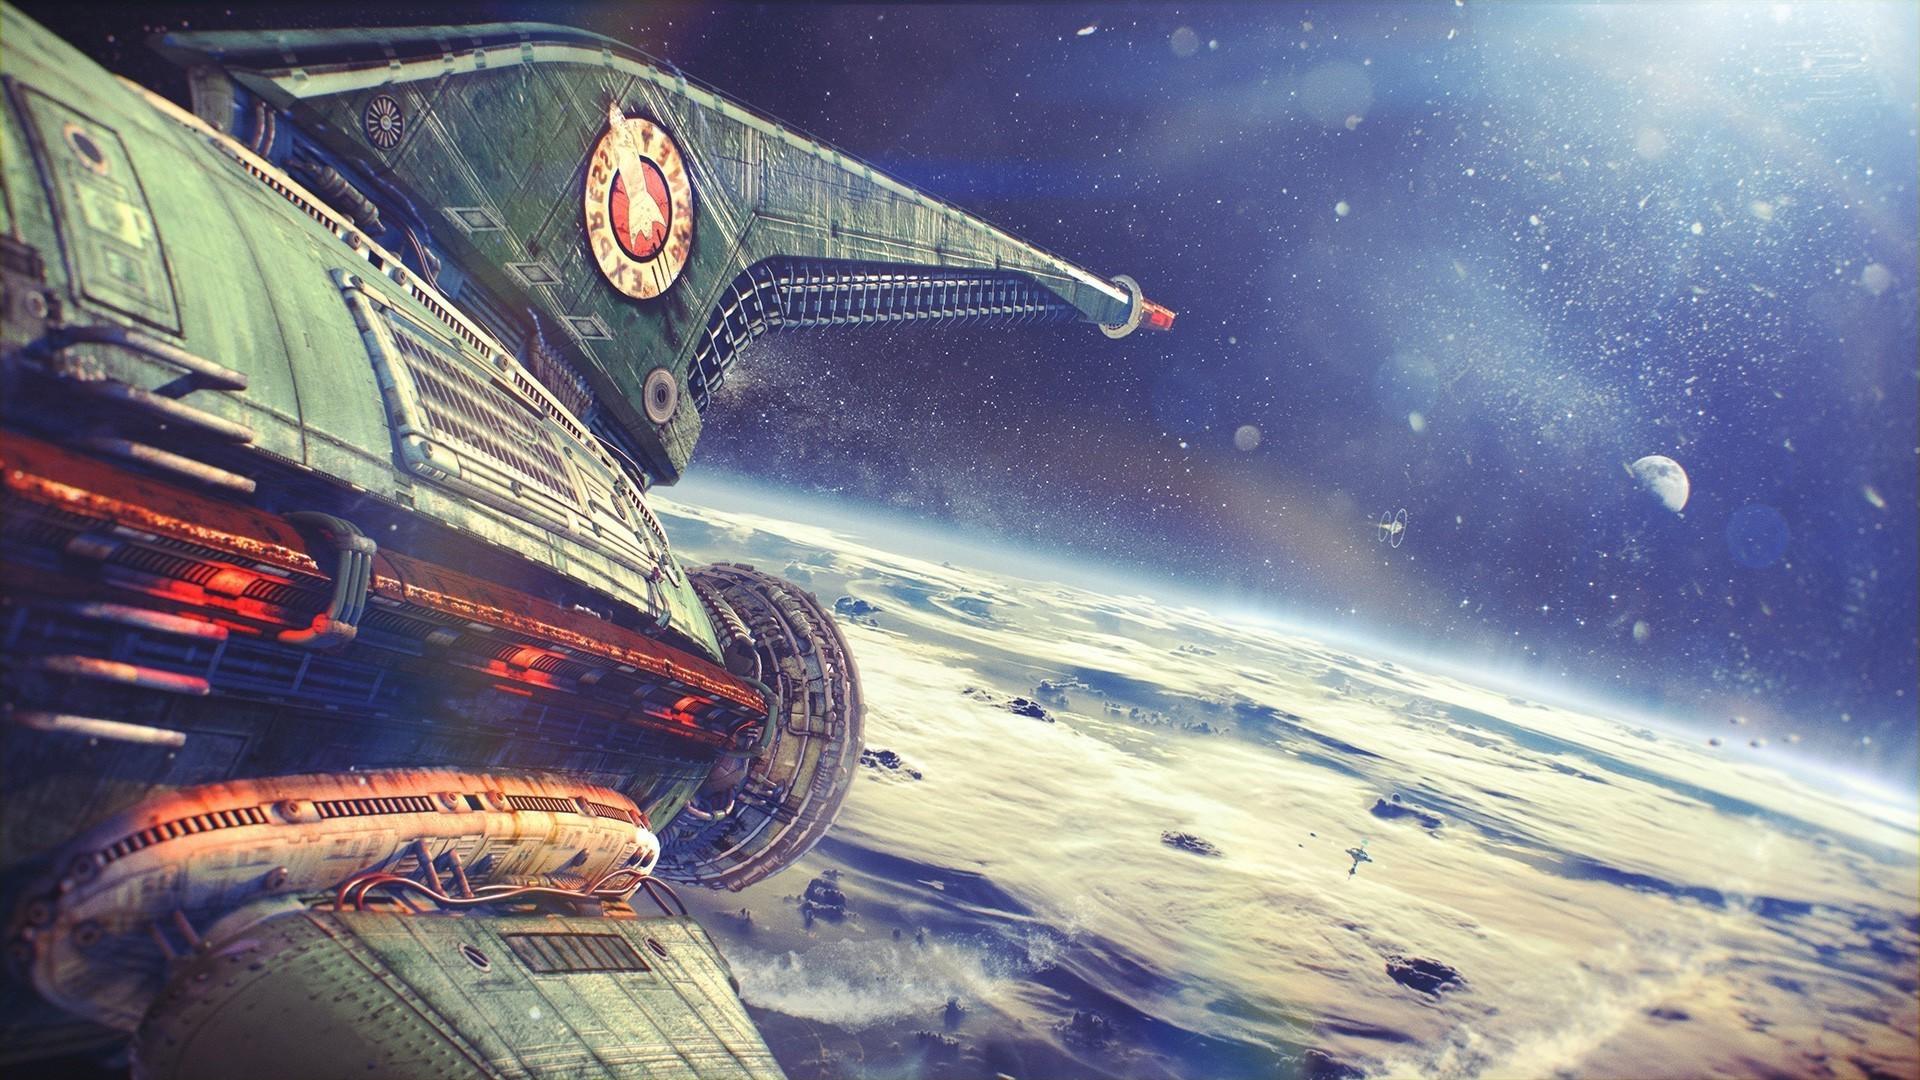 Futurama, Planet Express, Spaceship, Space Wallpaper HD